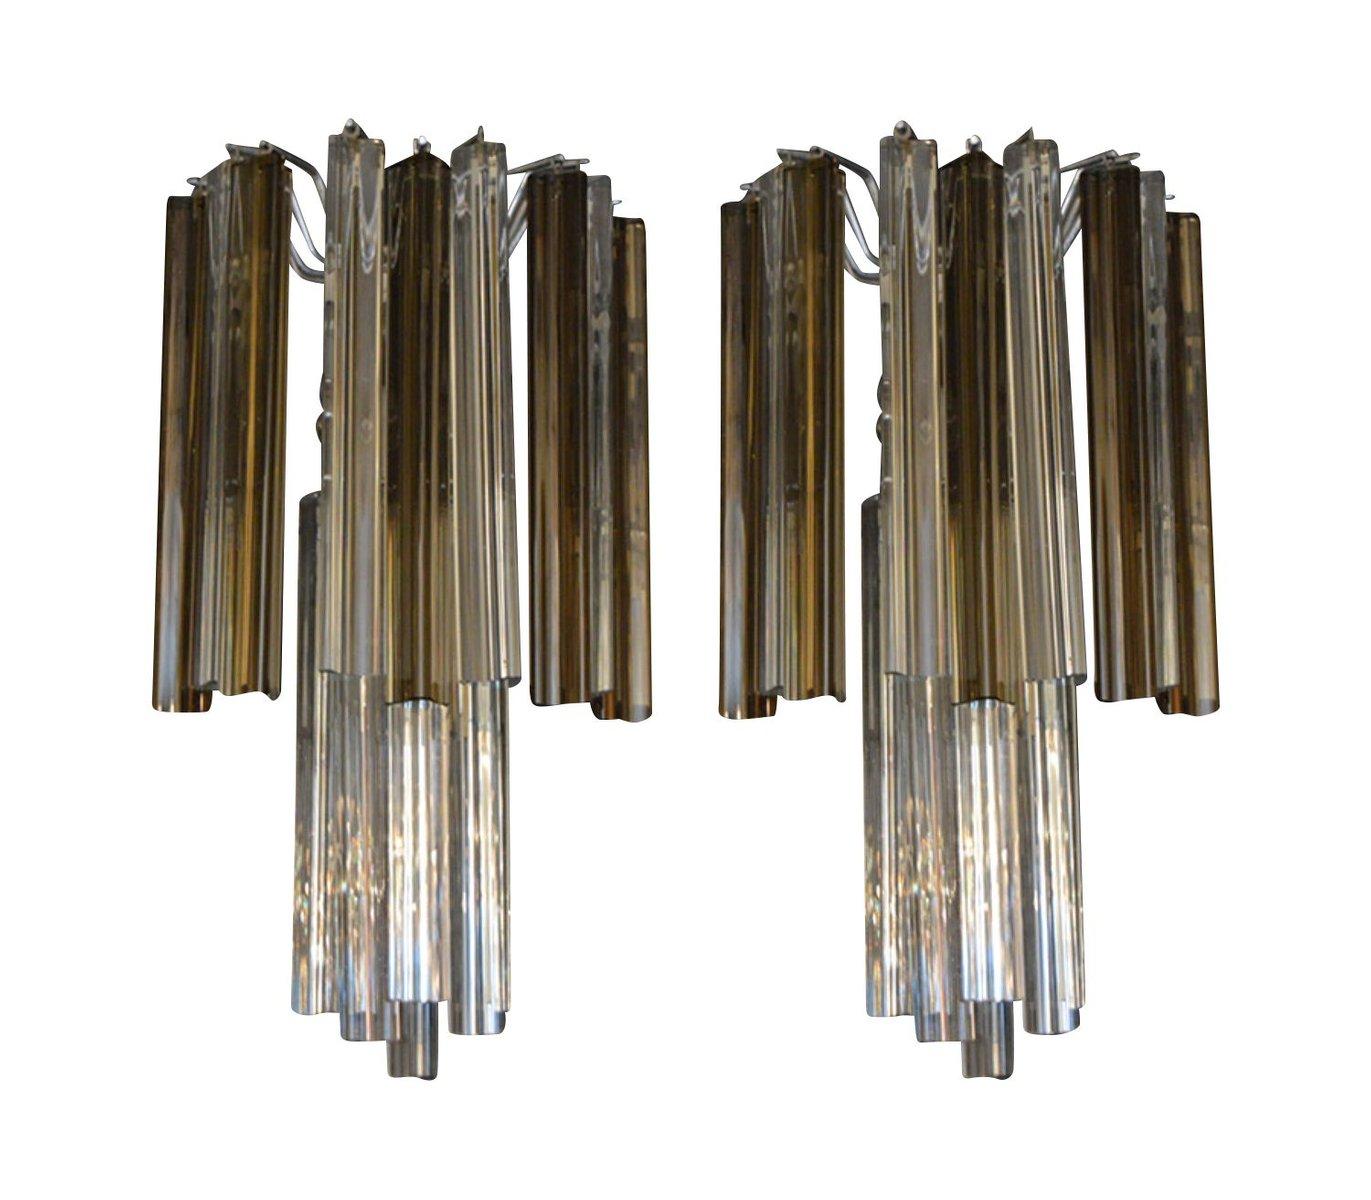 Dreieckige Glas Wandlampen von Venini, 1970er, 2er Set